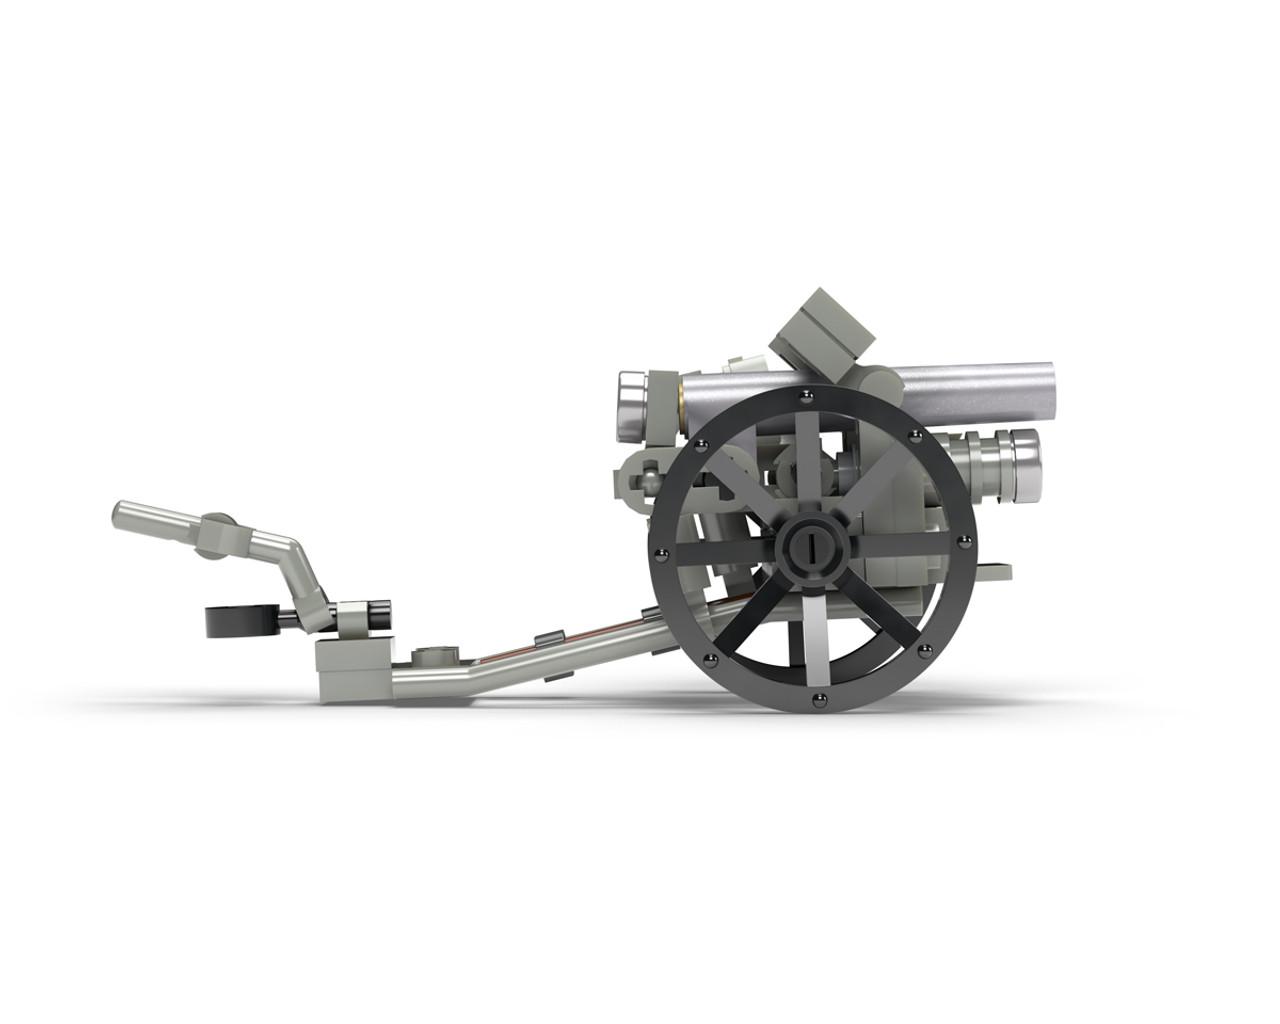 Ordnance QF 4.5 inch Howitzer